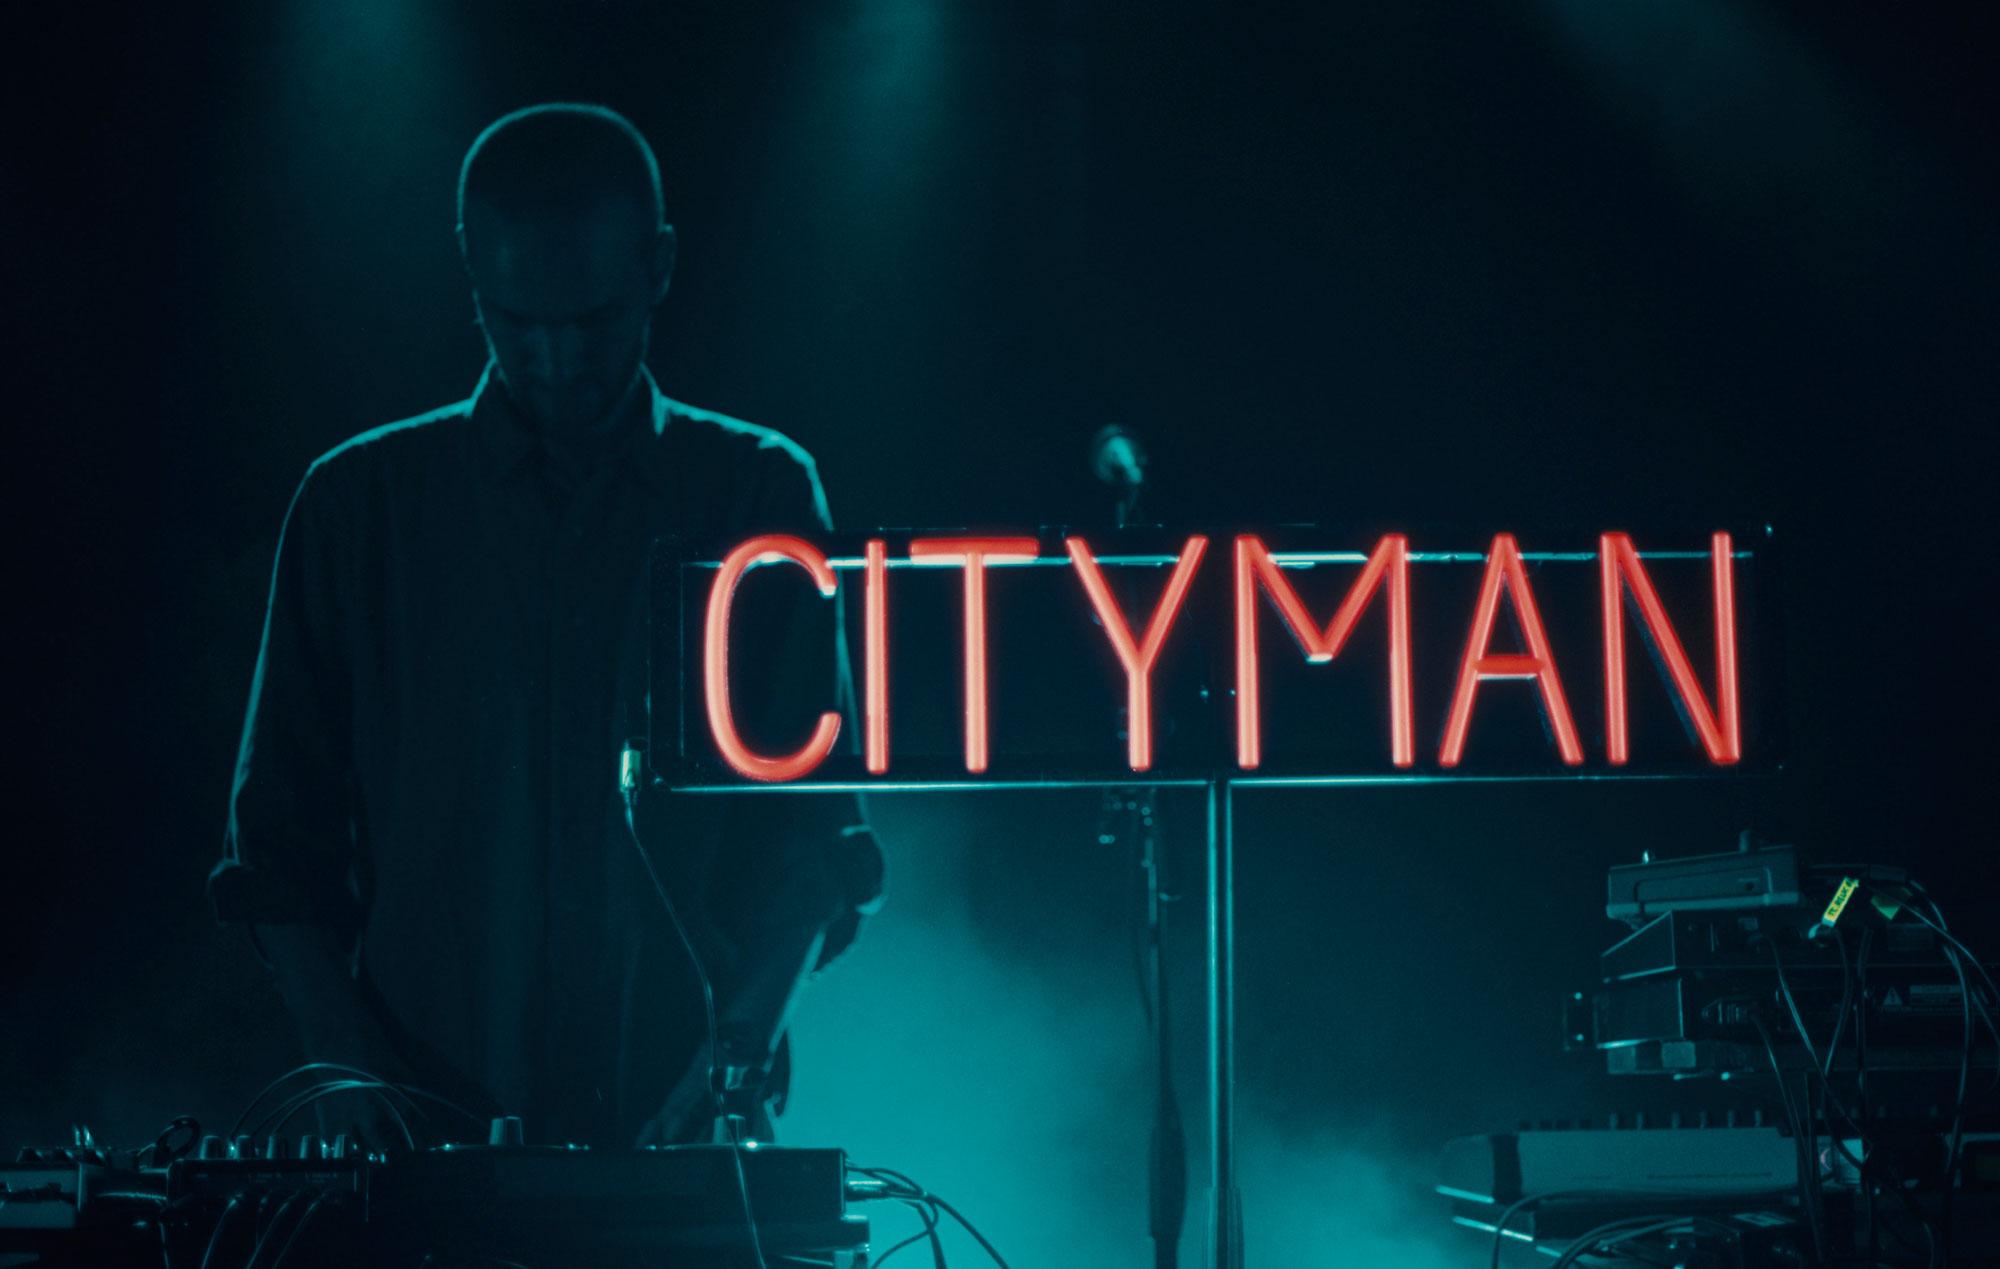 cityman6.jpg